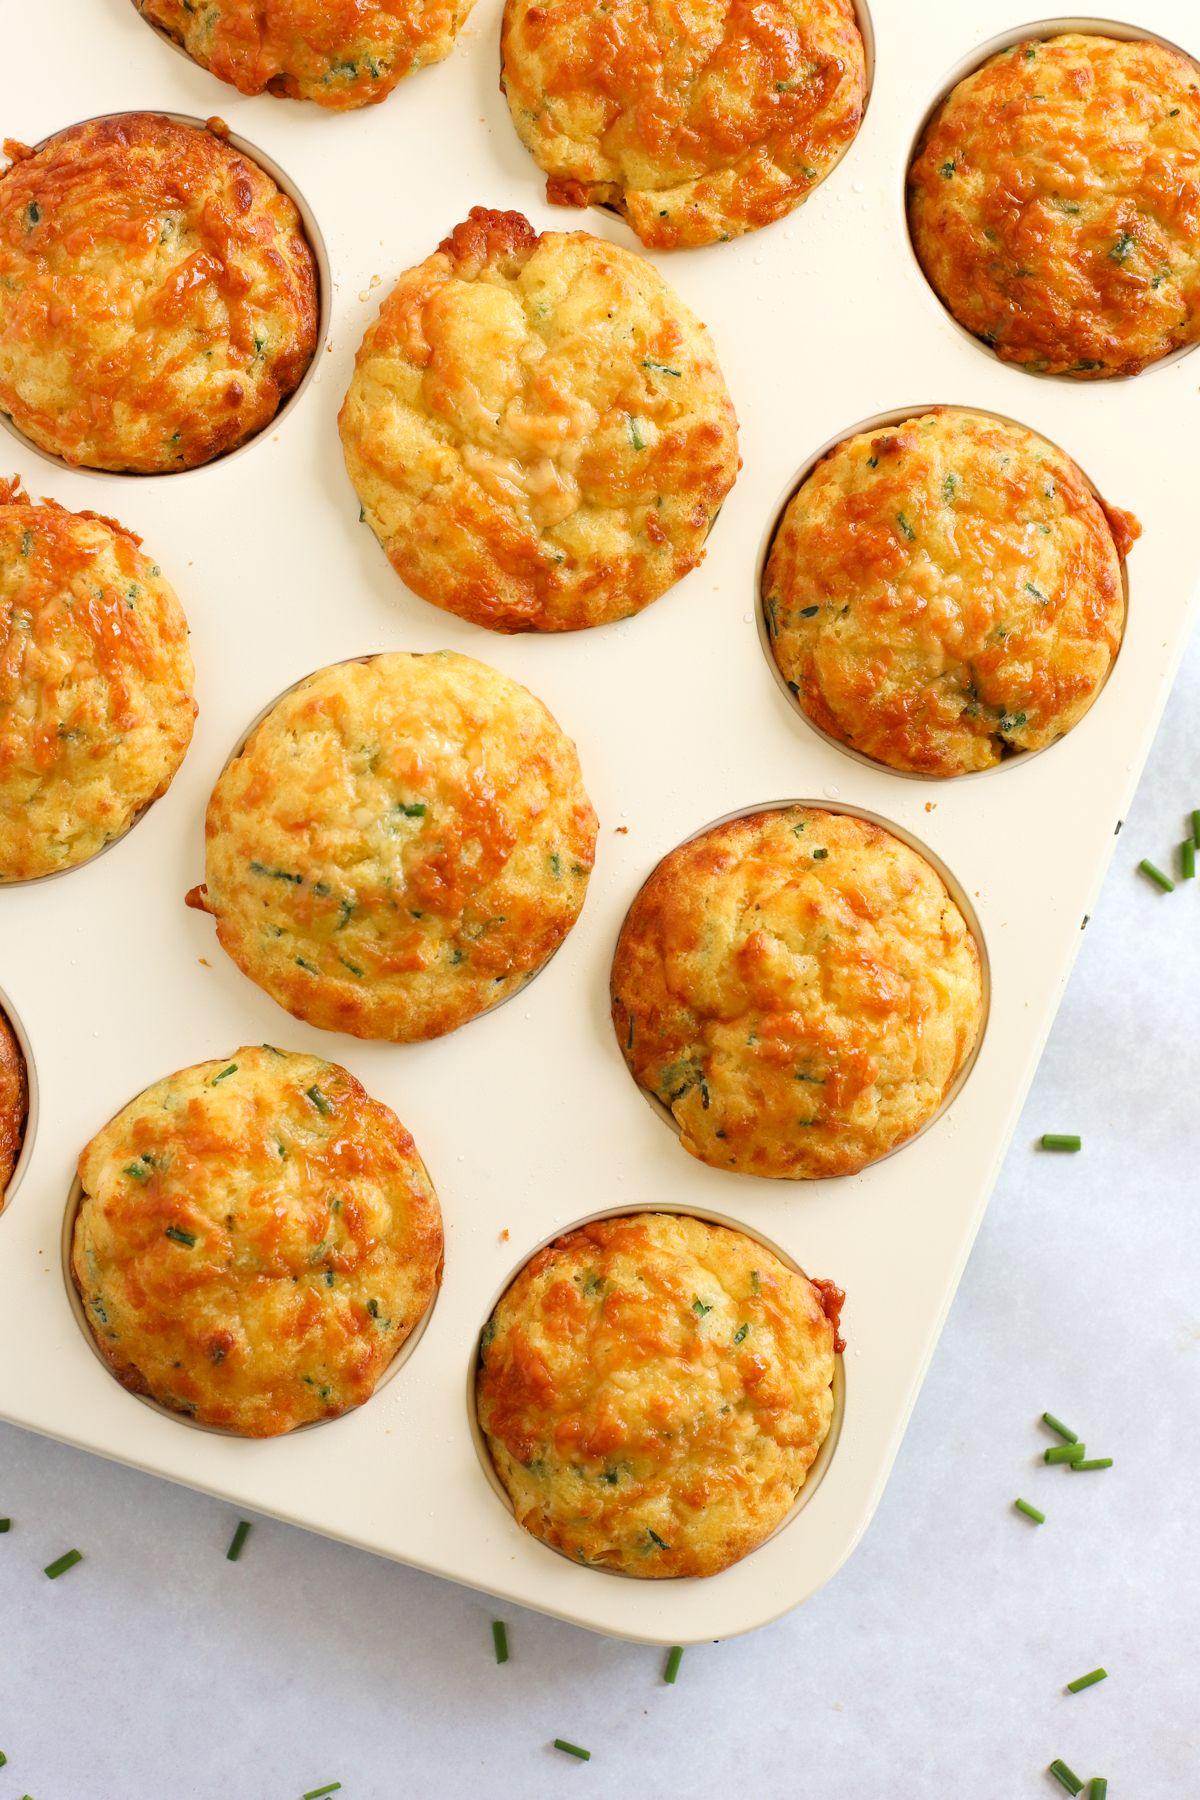 Savoury Muffins With Cheese And Sweetcorn Quick Yummy Recipe Savory Muffins Recipes Savoury Muffins Vegetarian Savory Snacks